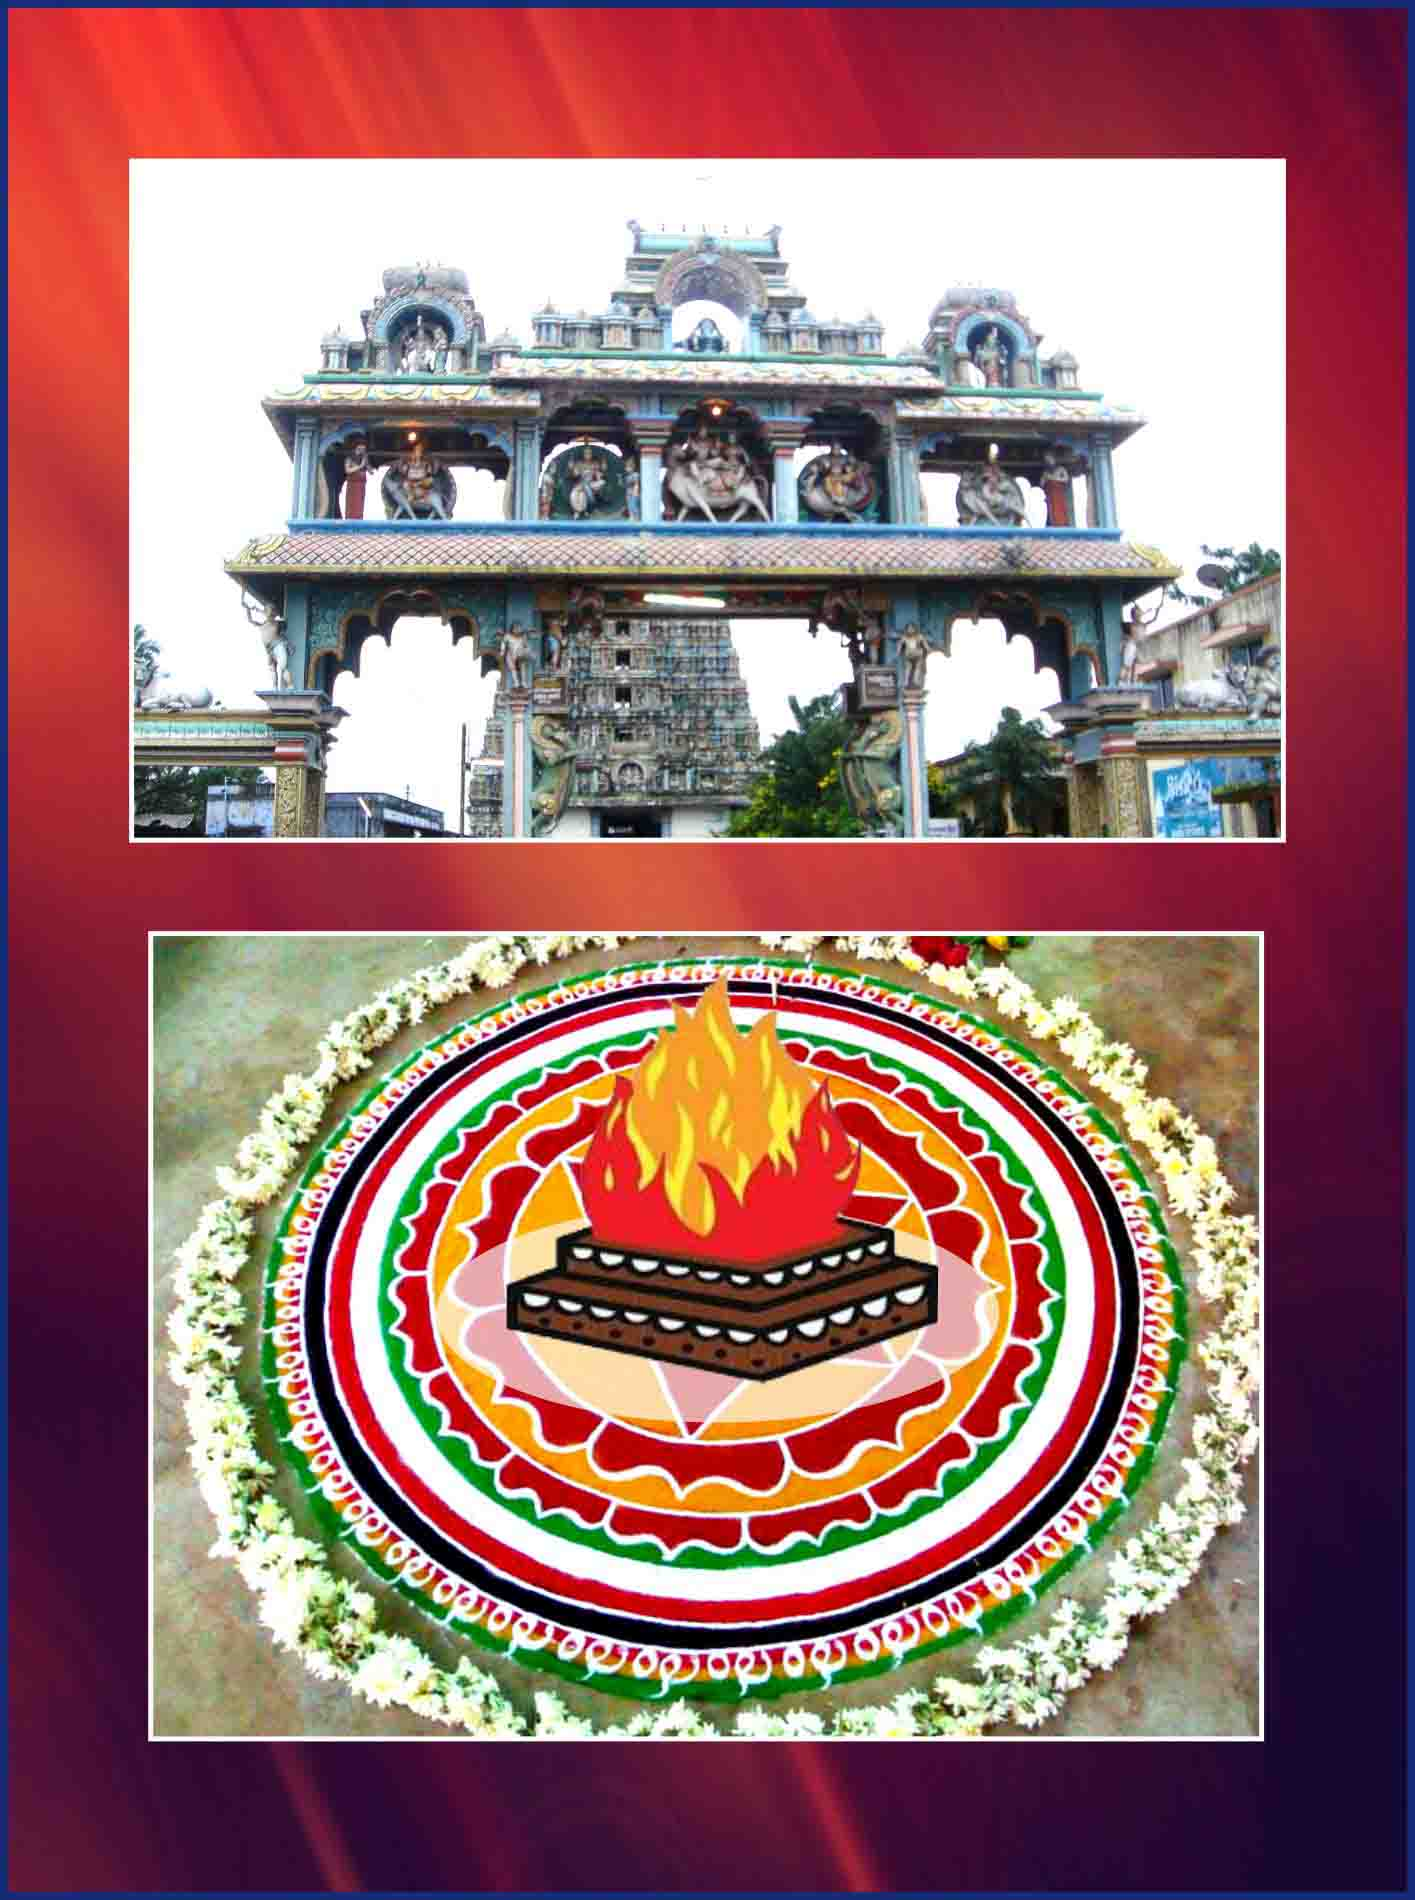 Thirukadaiyur-Spl Parihara Puja for longevity